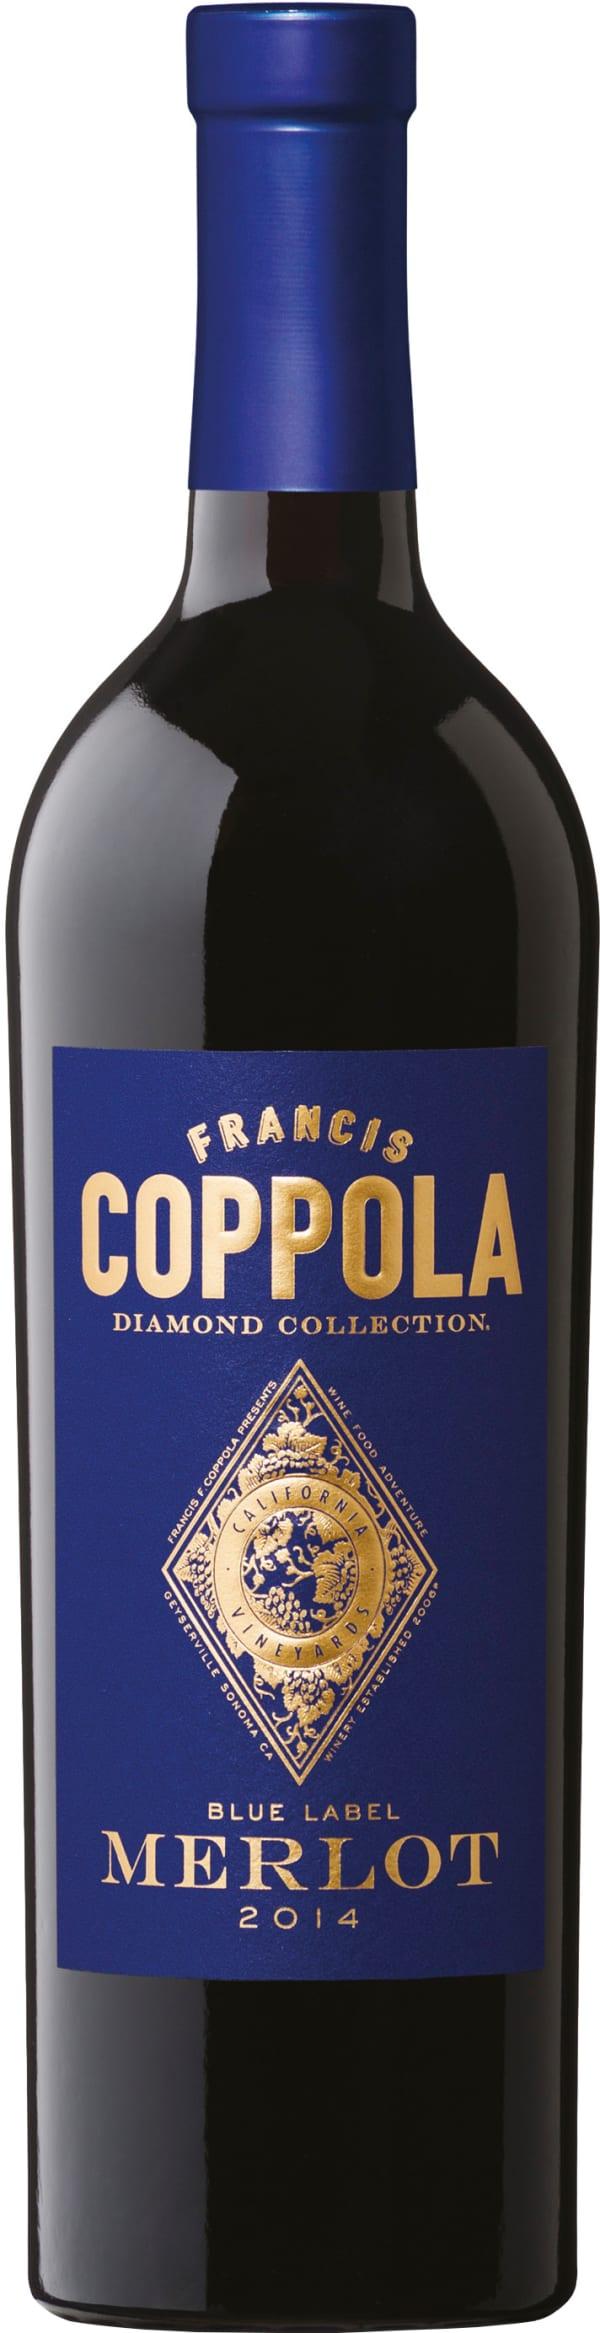 Coppola Diamond Collection Merlot 2015